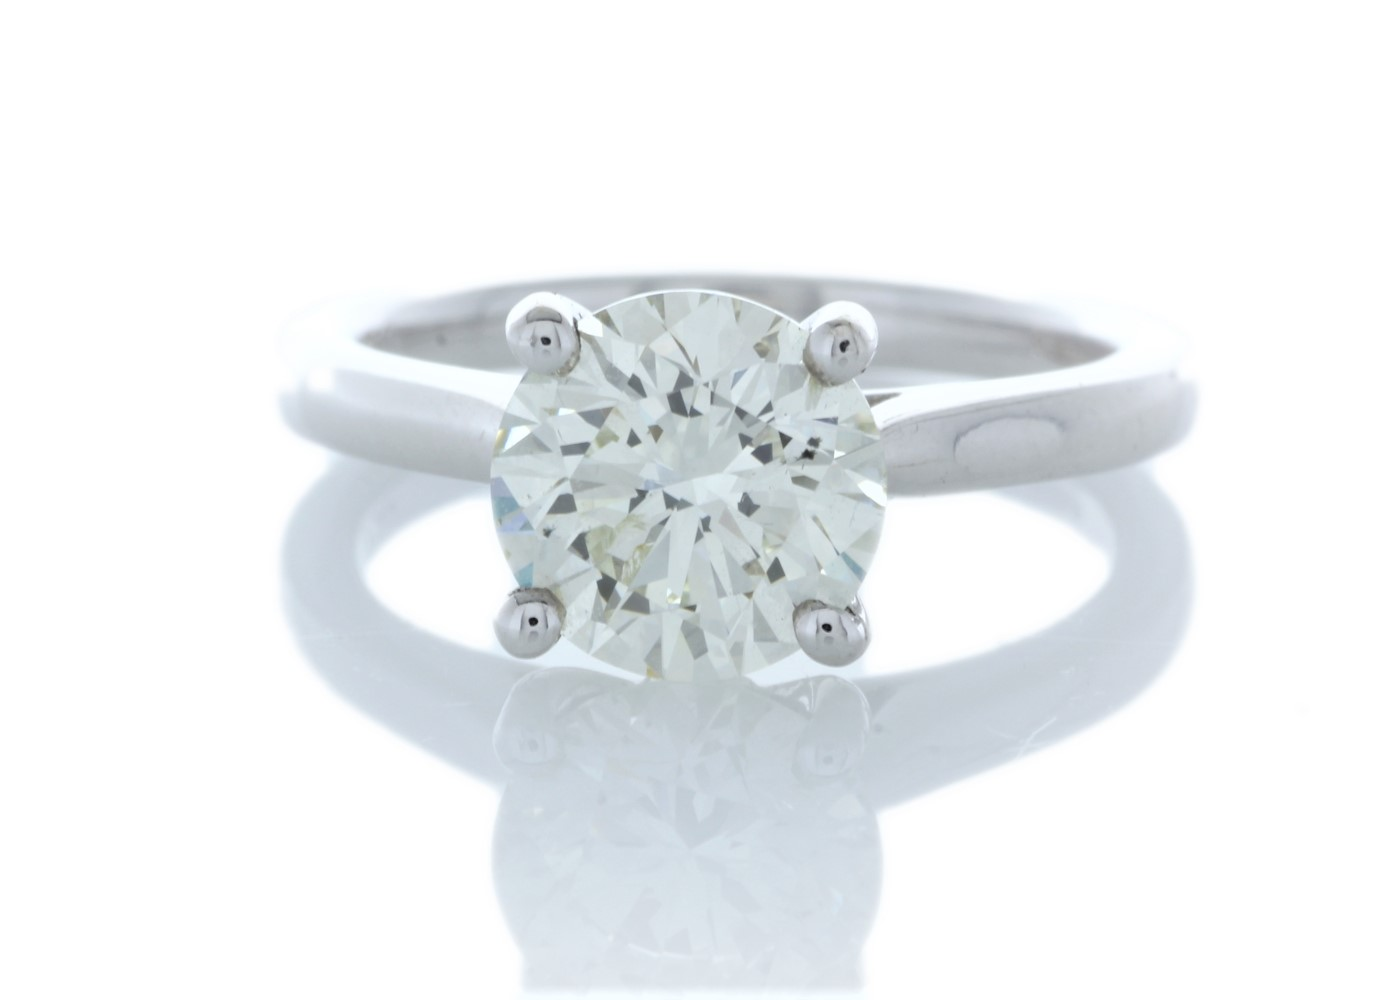 18ct White Gold Single Stone Claw Set Diamond Ring 2.05 Carats